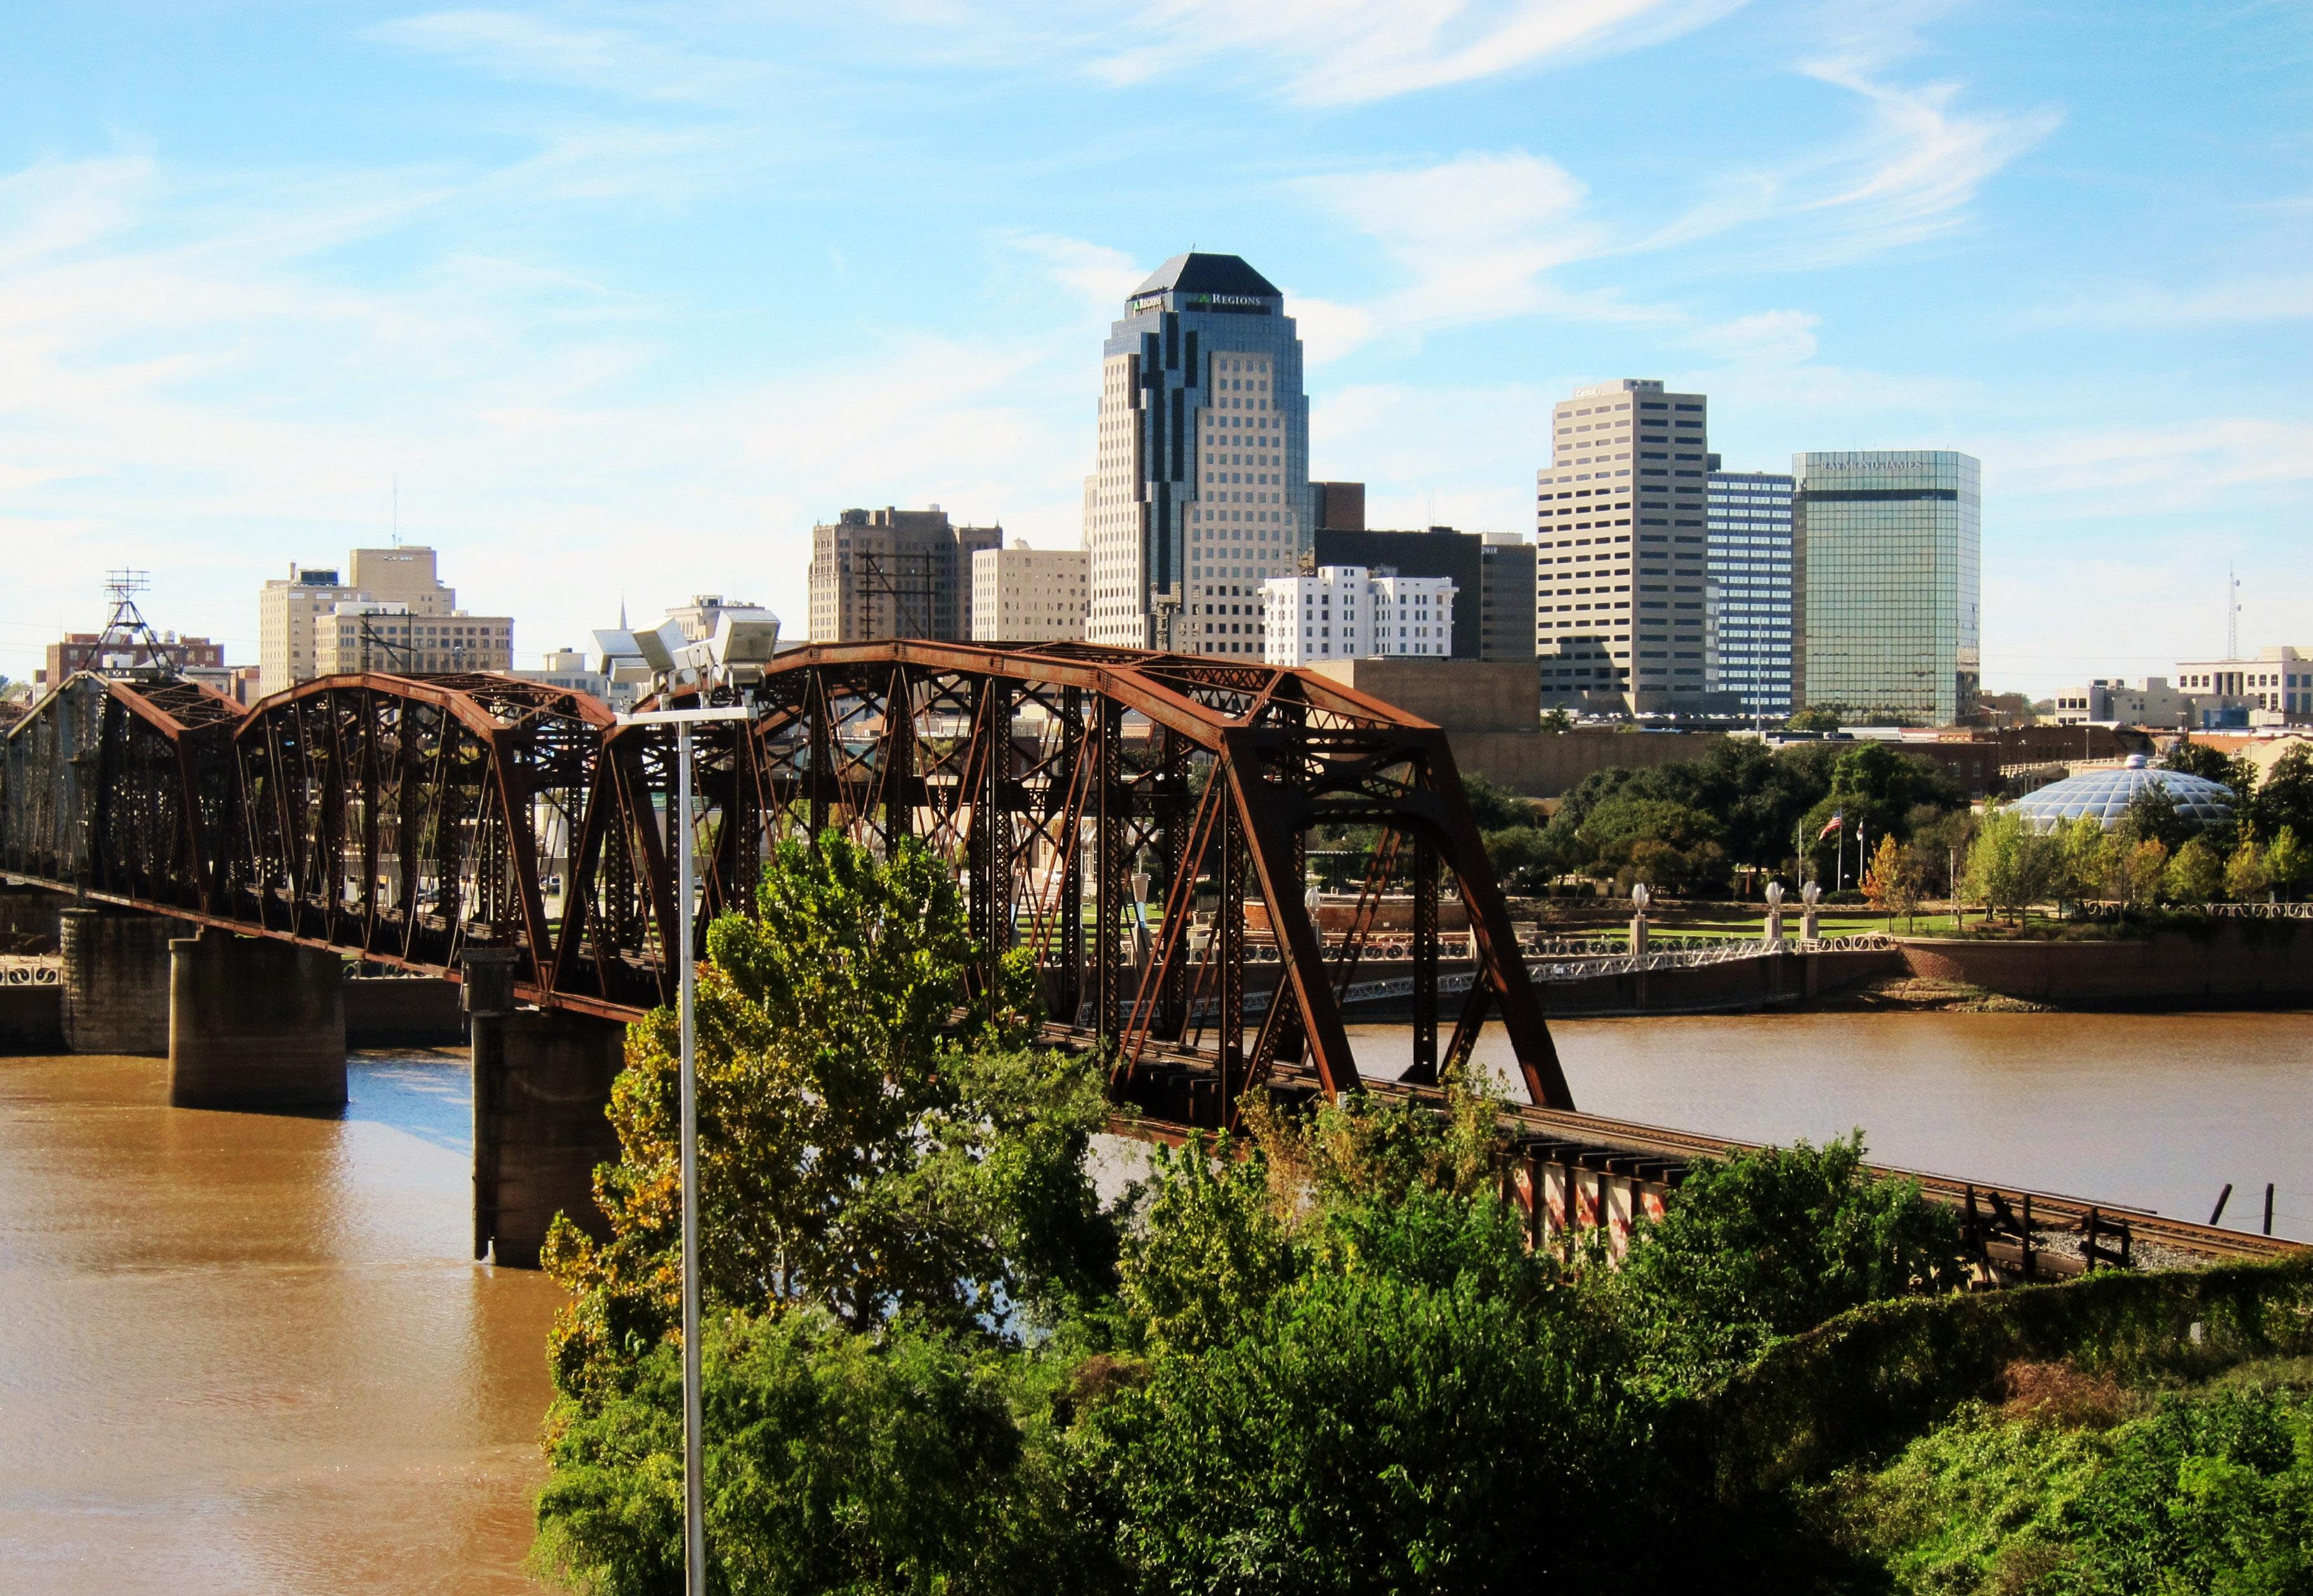 thành phố Biloxi, Mississippi